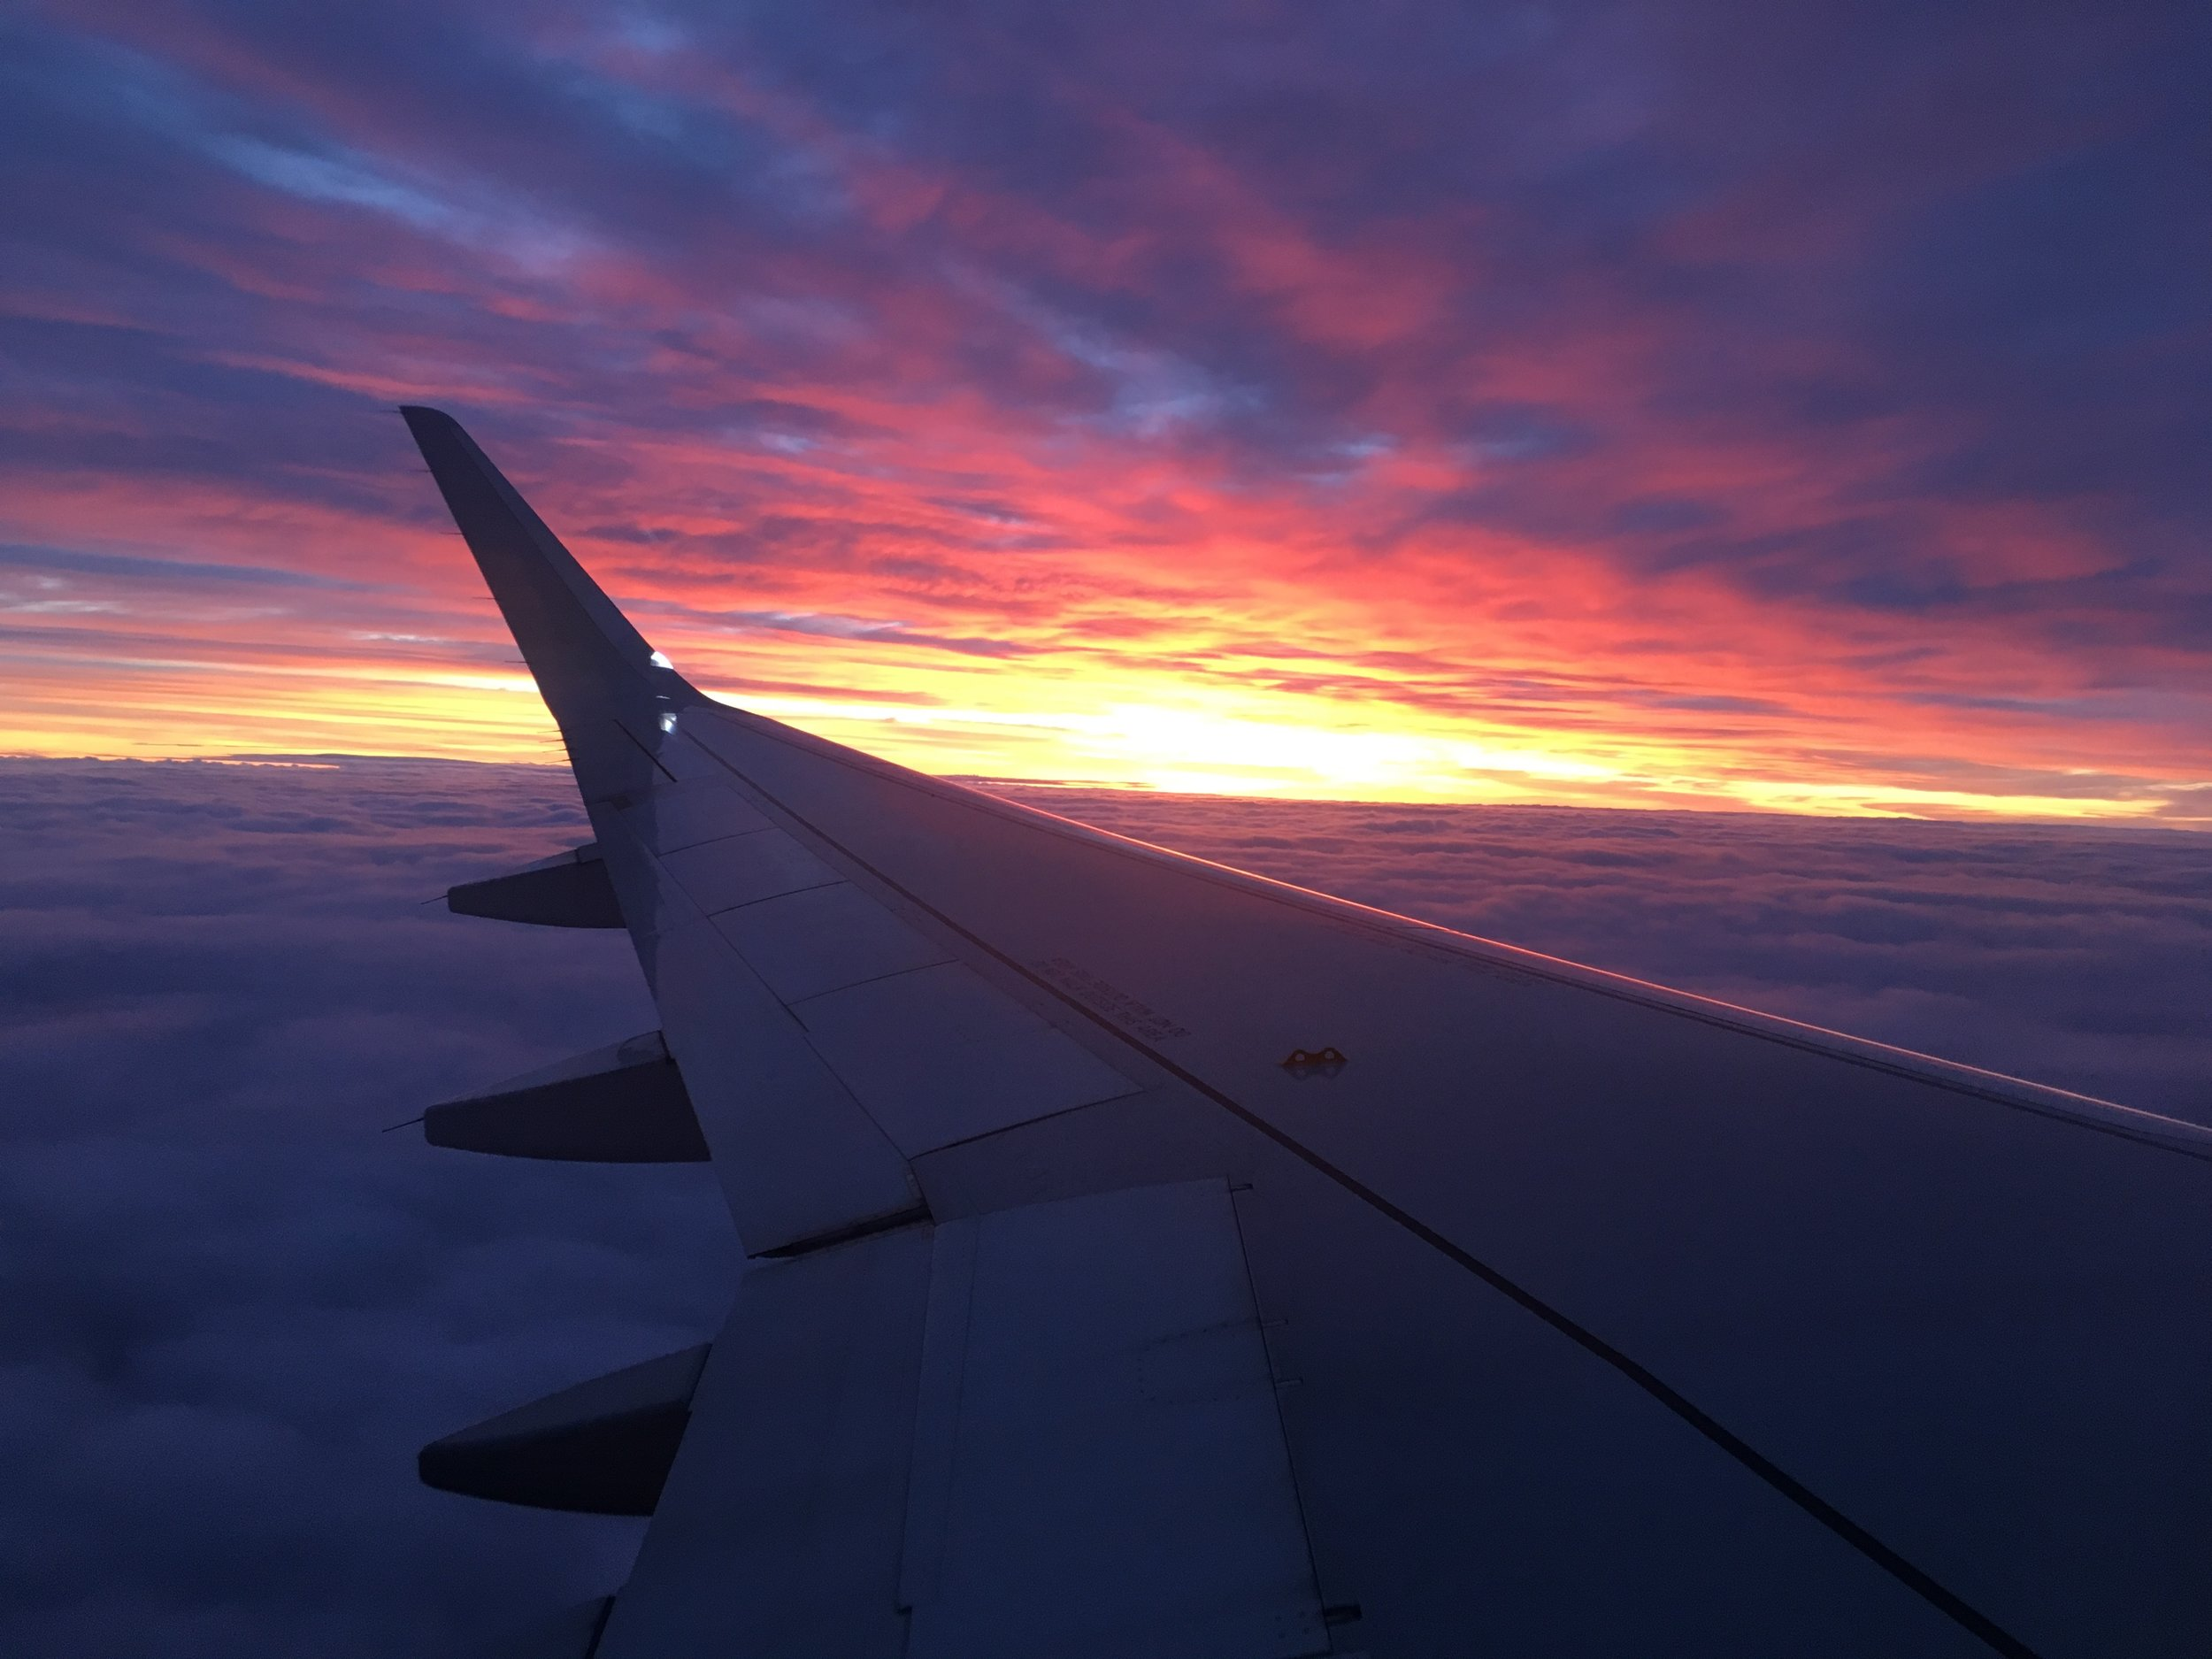 sunset_plain_01.jpeg